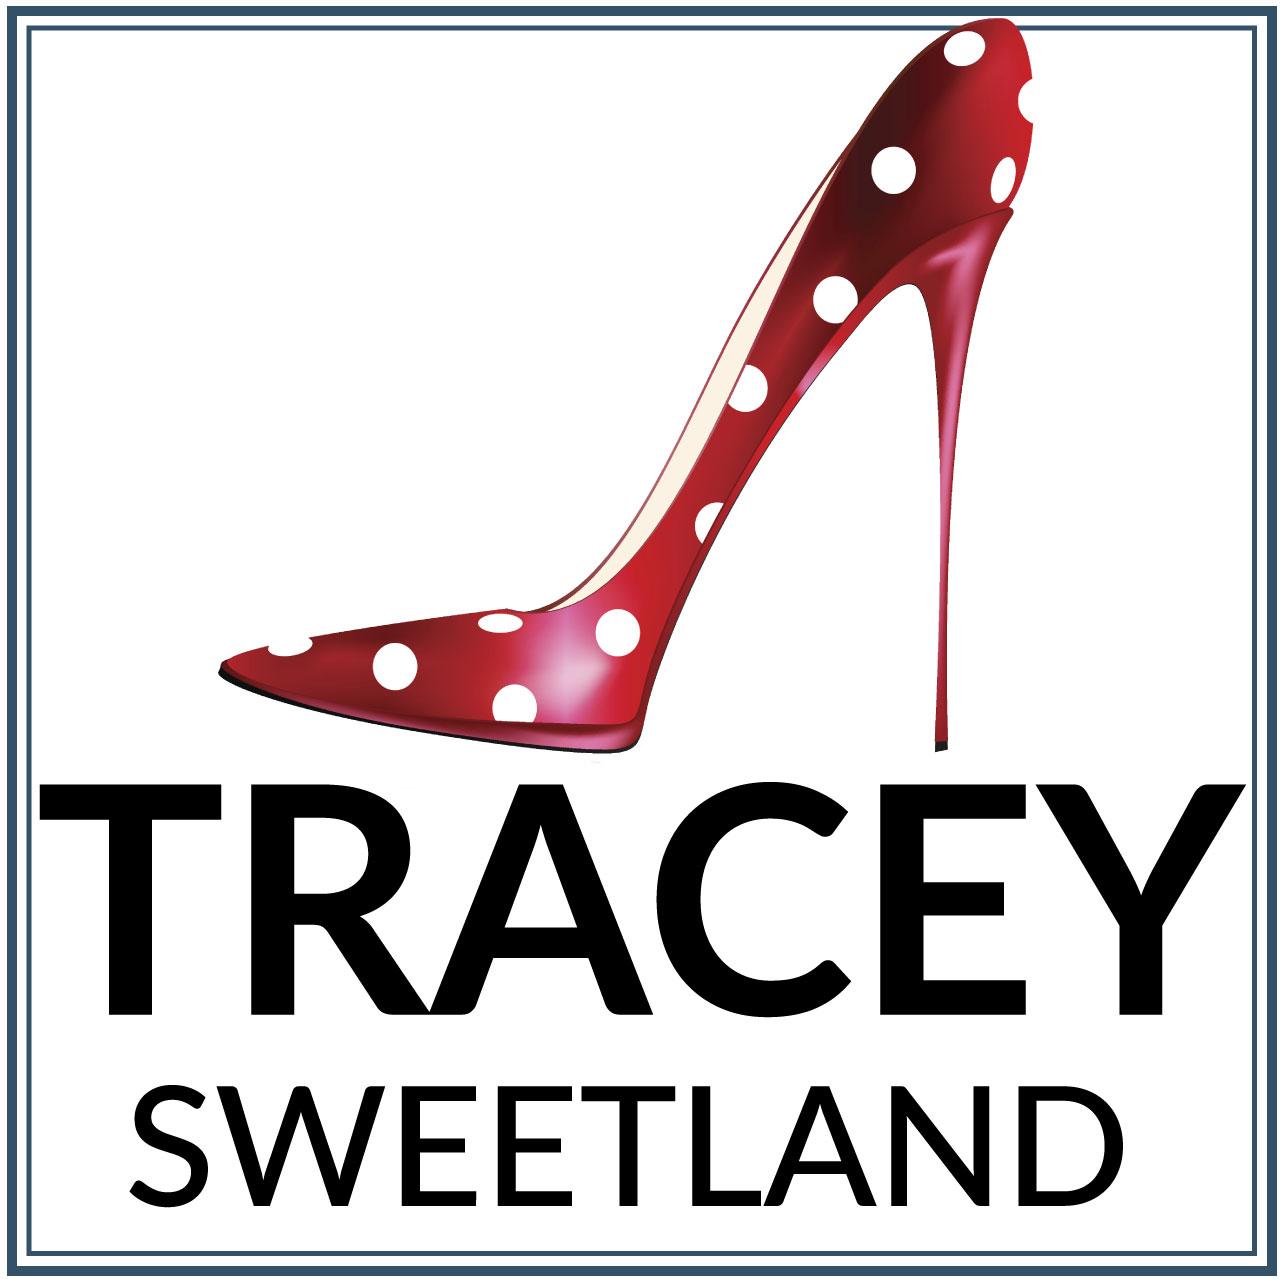 Tracey Sweetland